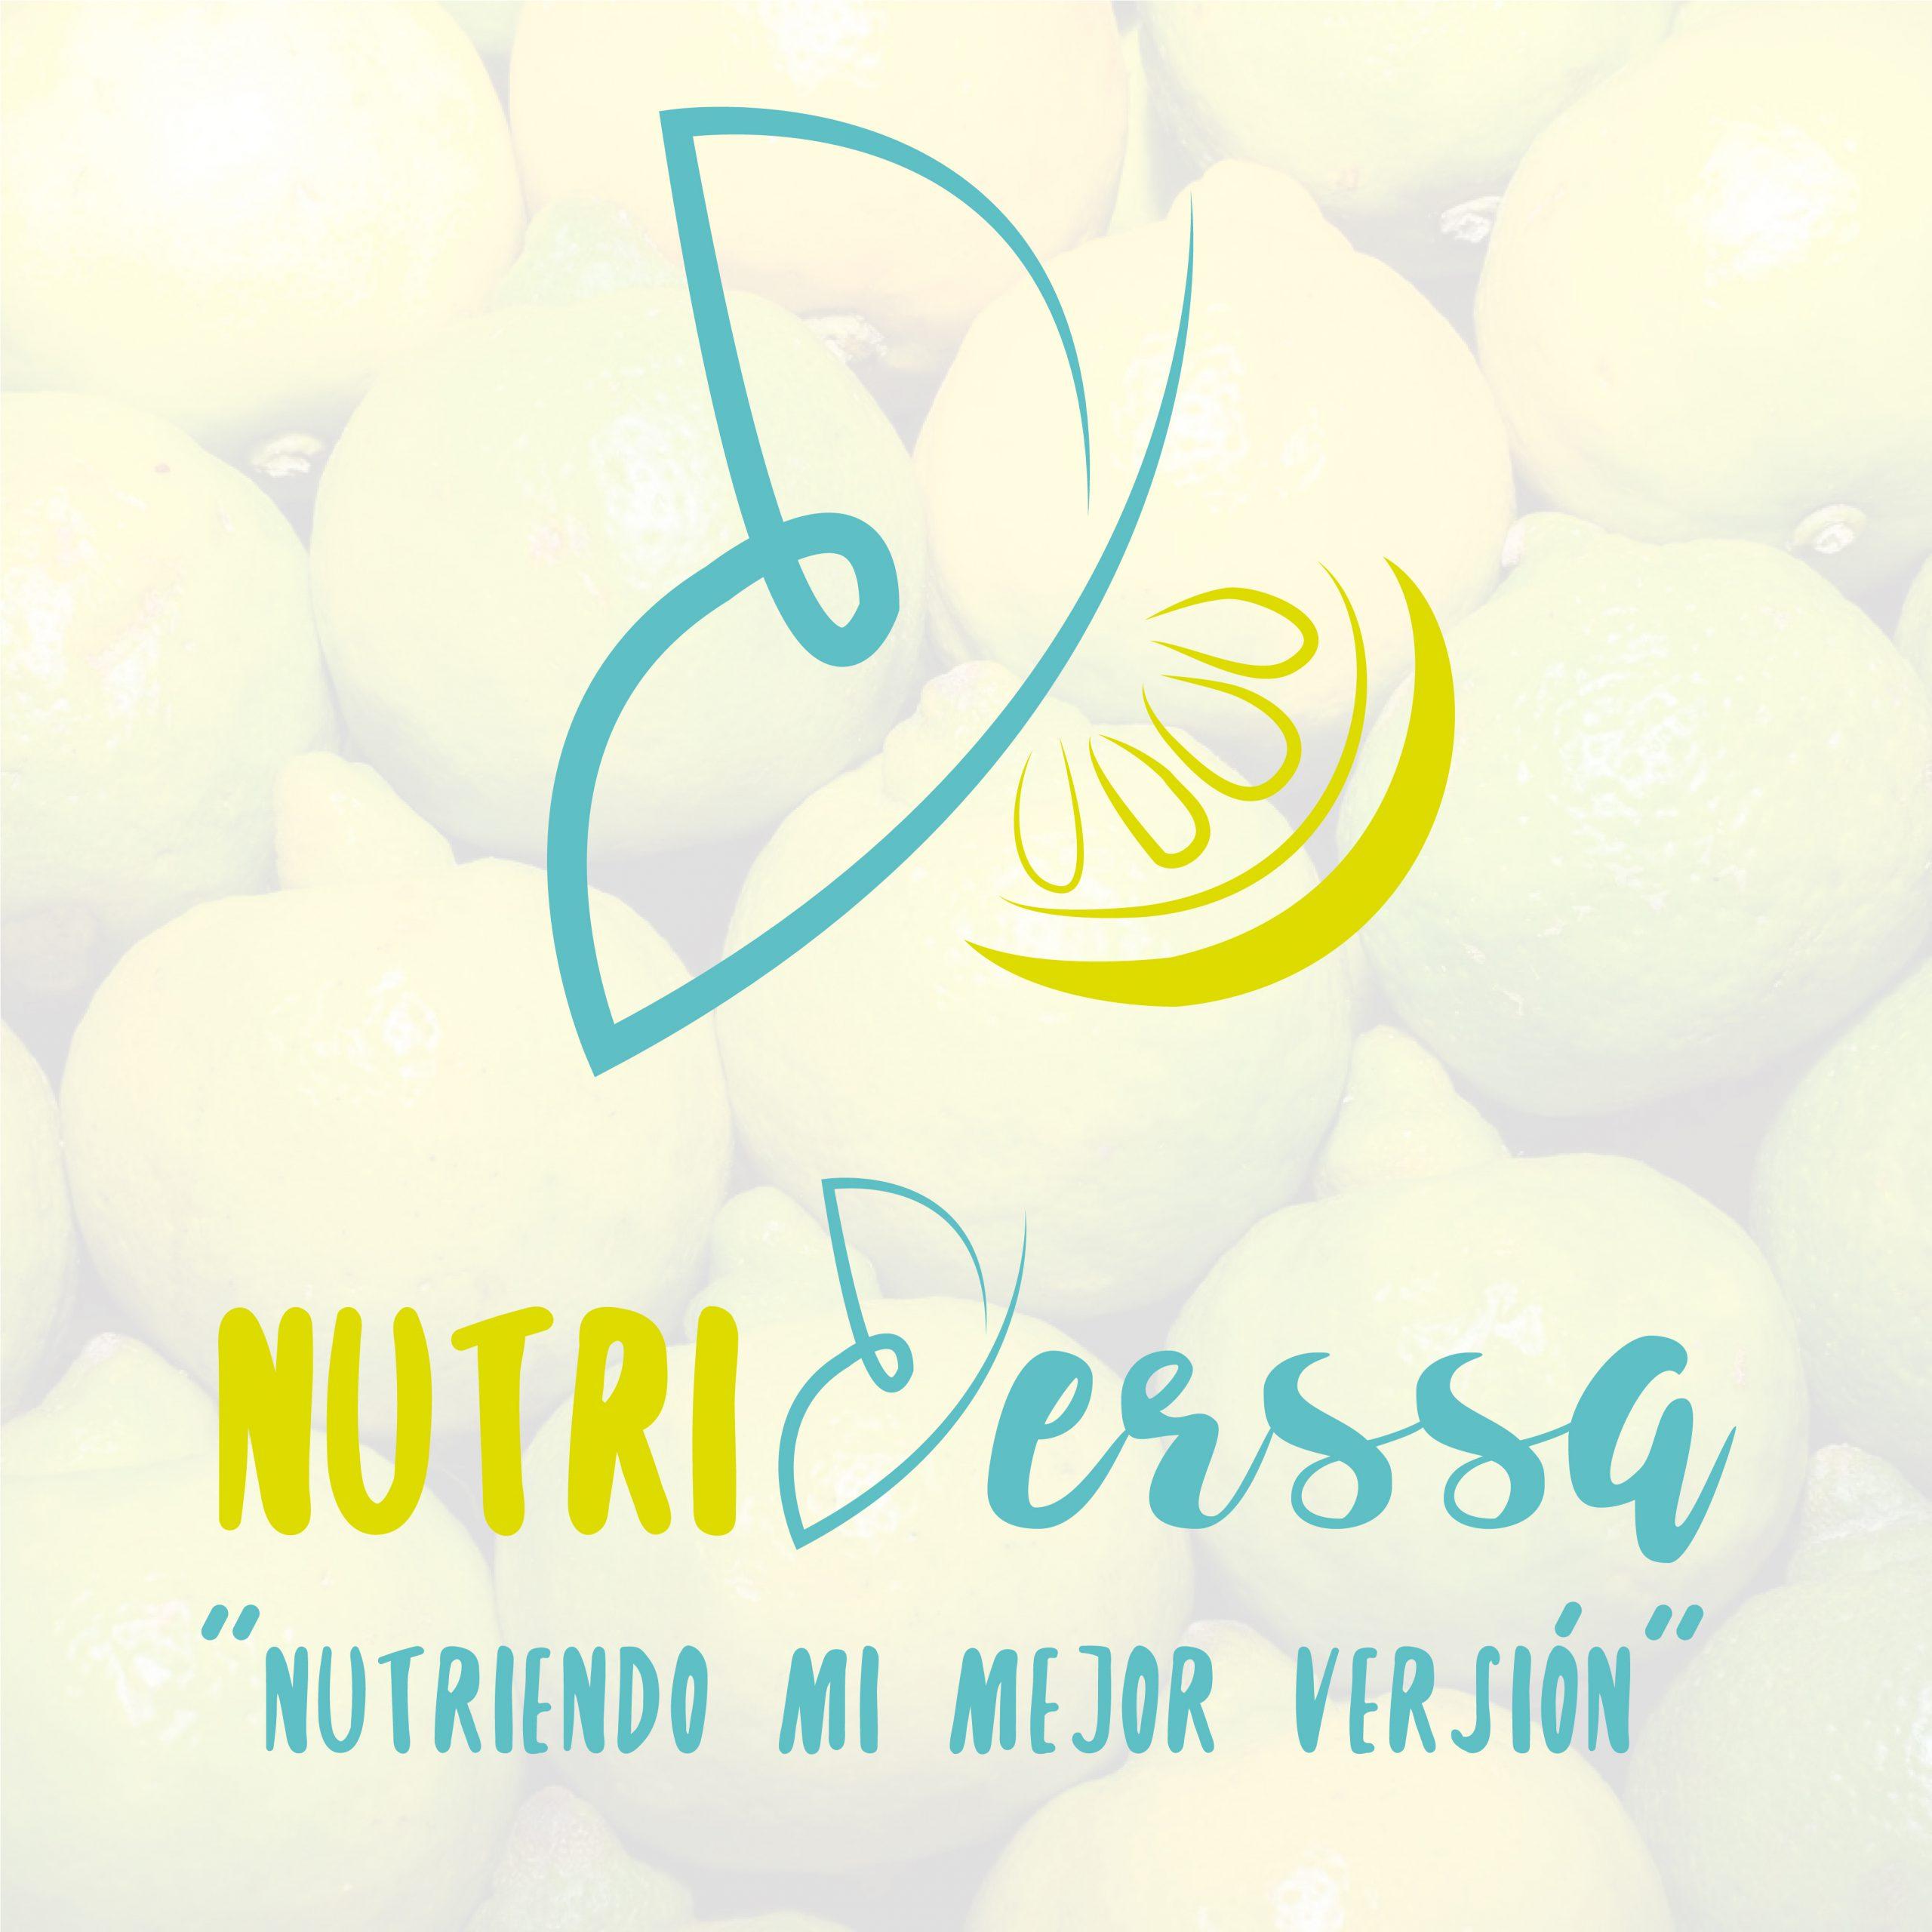 NutriVerssa